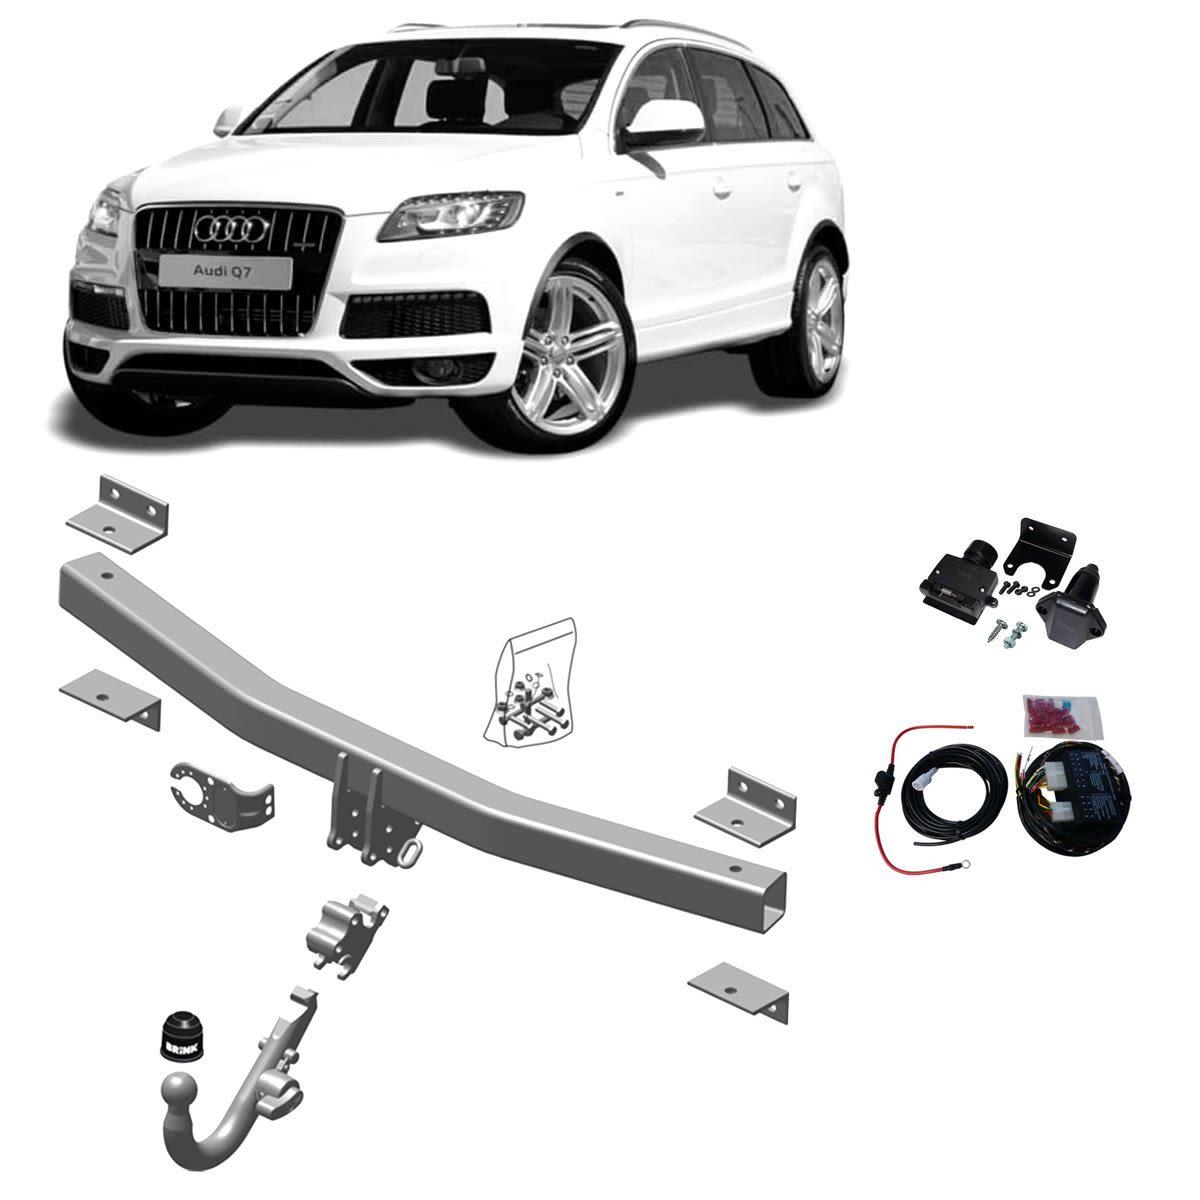 Brink Towbar to suit Audi Q7 (03/2007 - 08/2015)